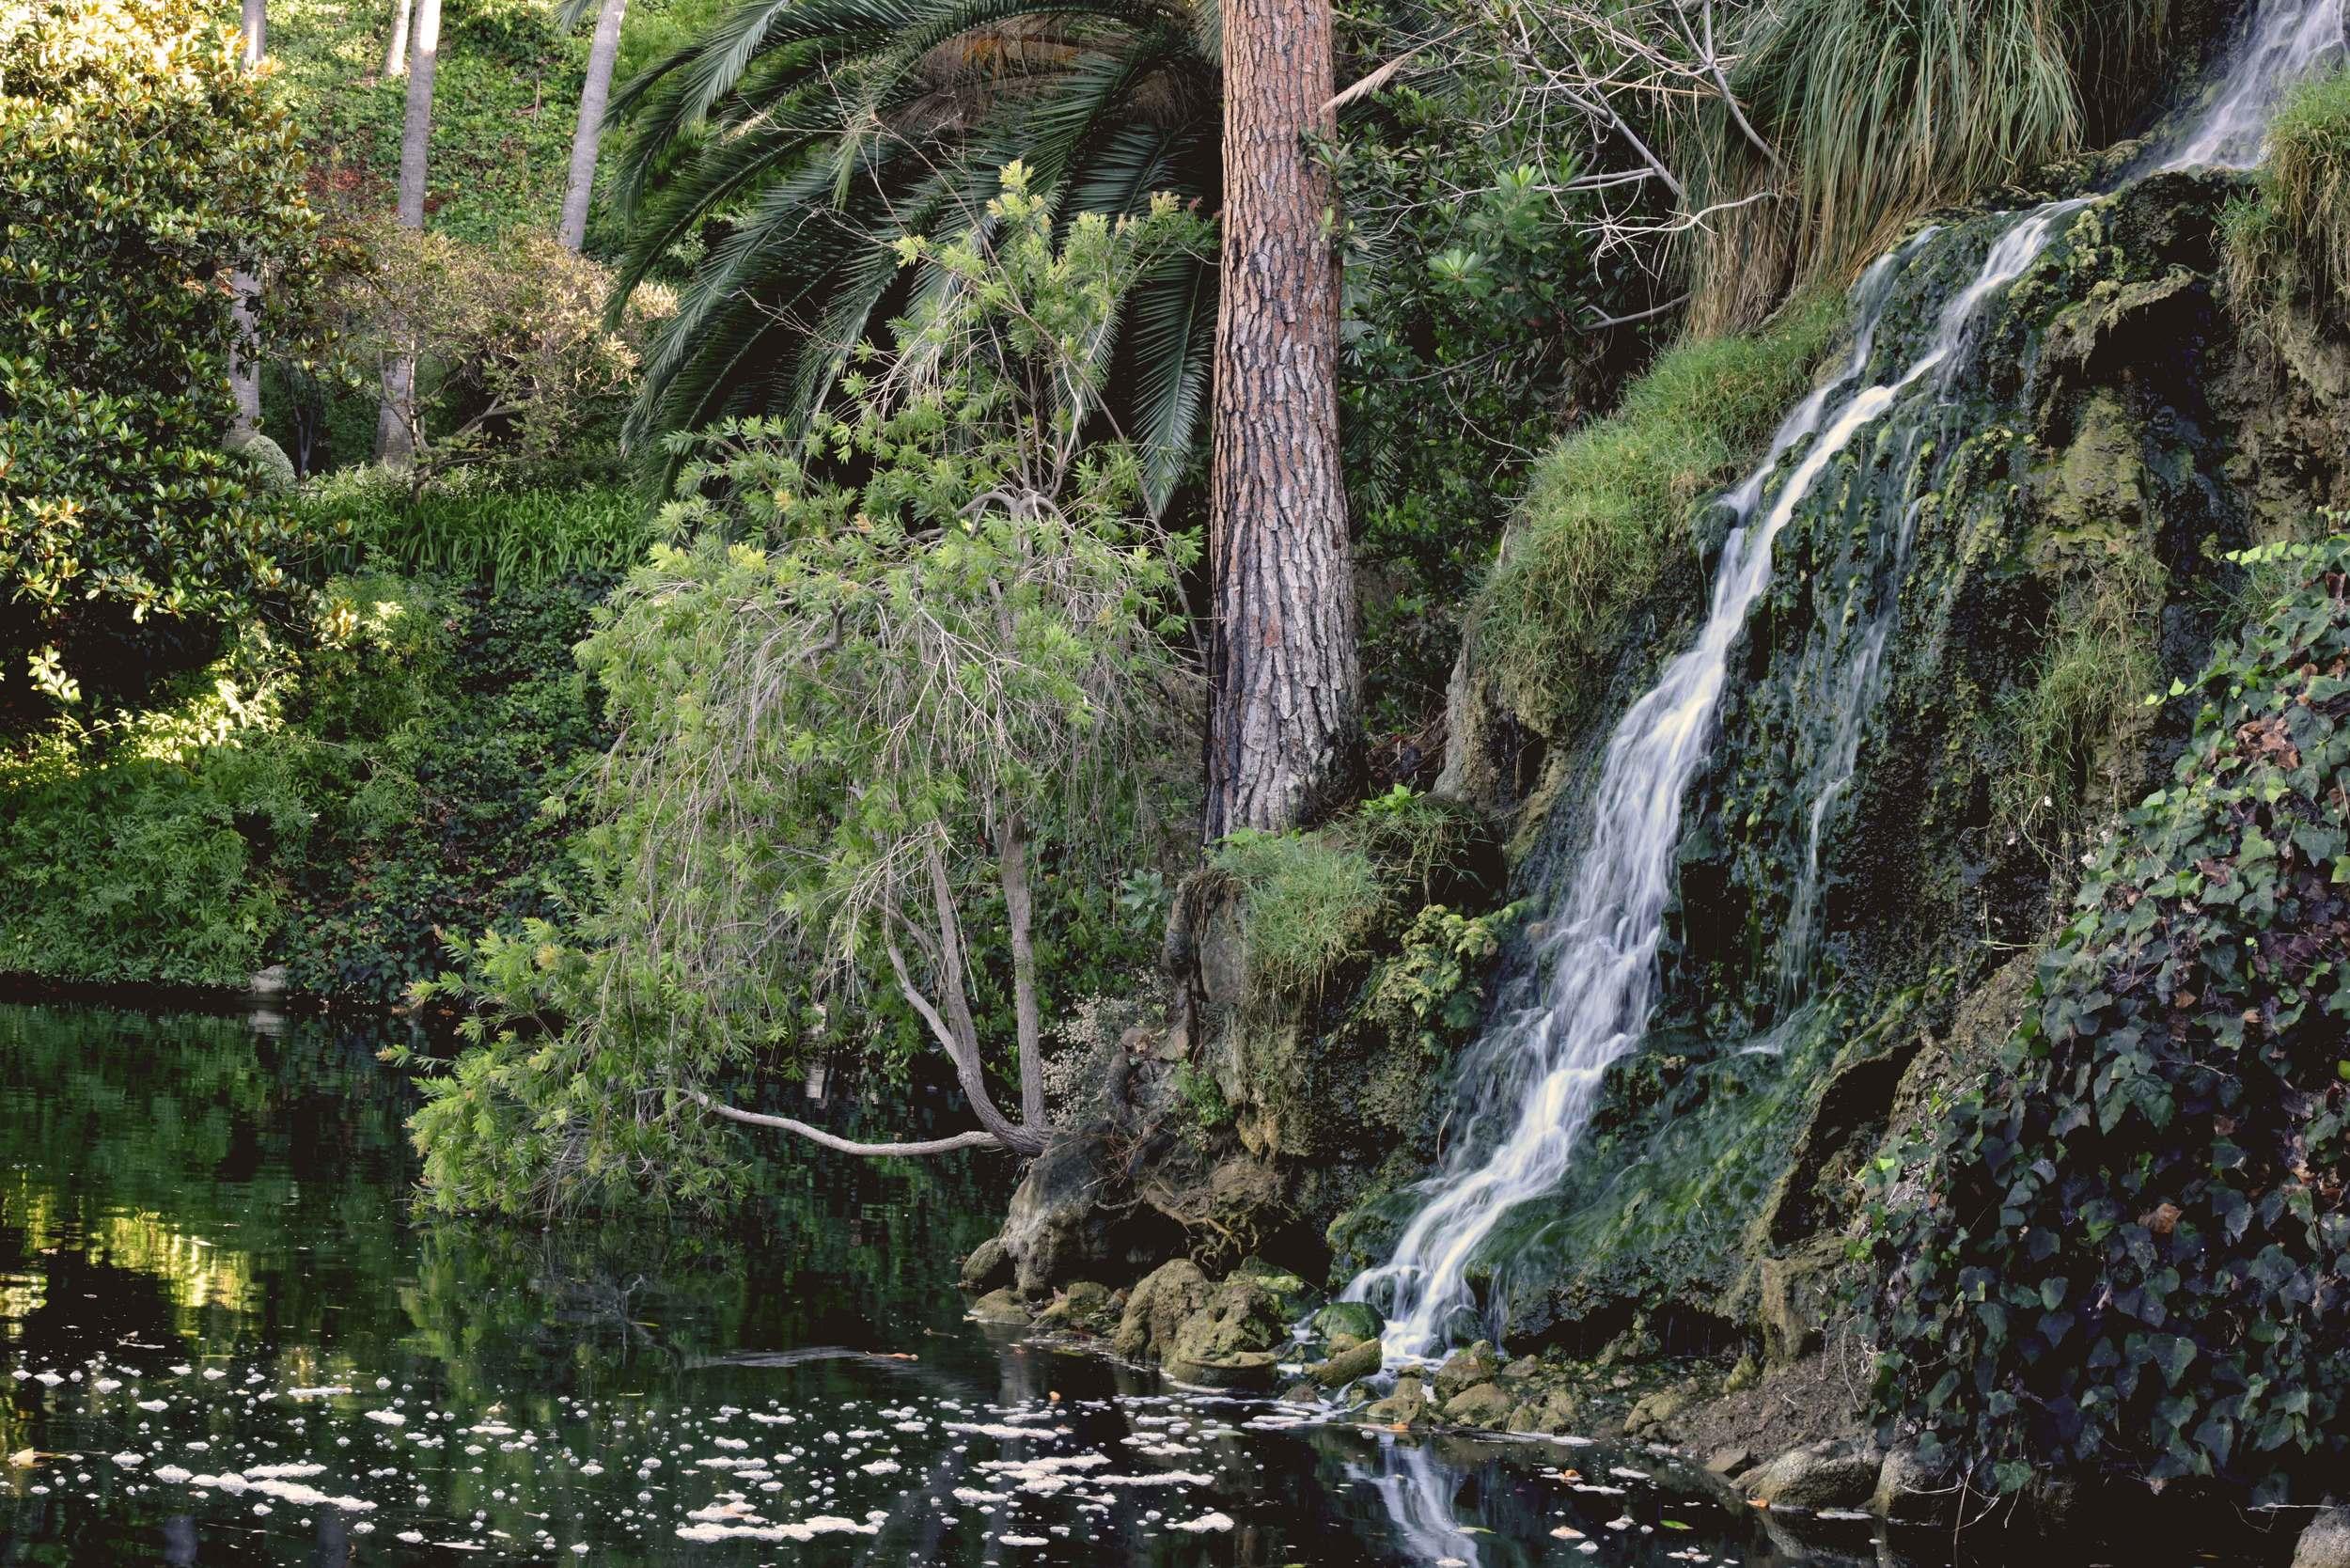 SRF Lake Shrine gardens, Pacific Palisades, CA. Image©thingstodot.com